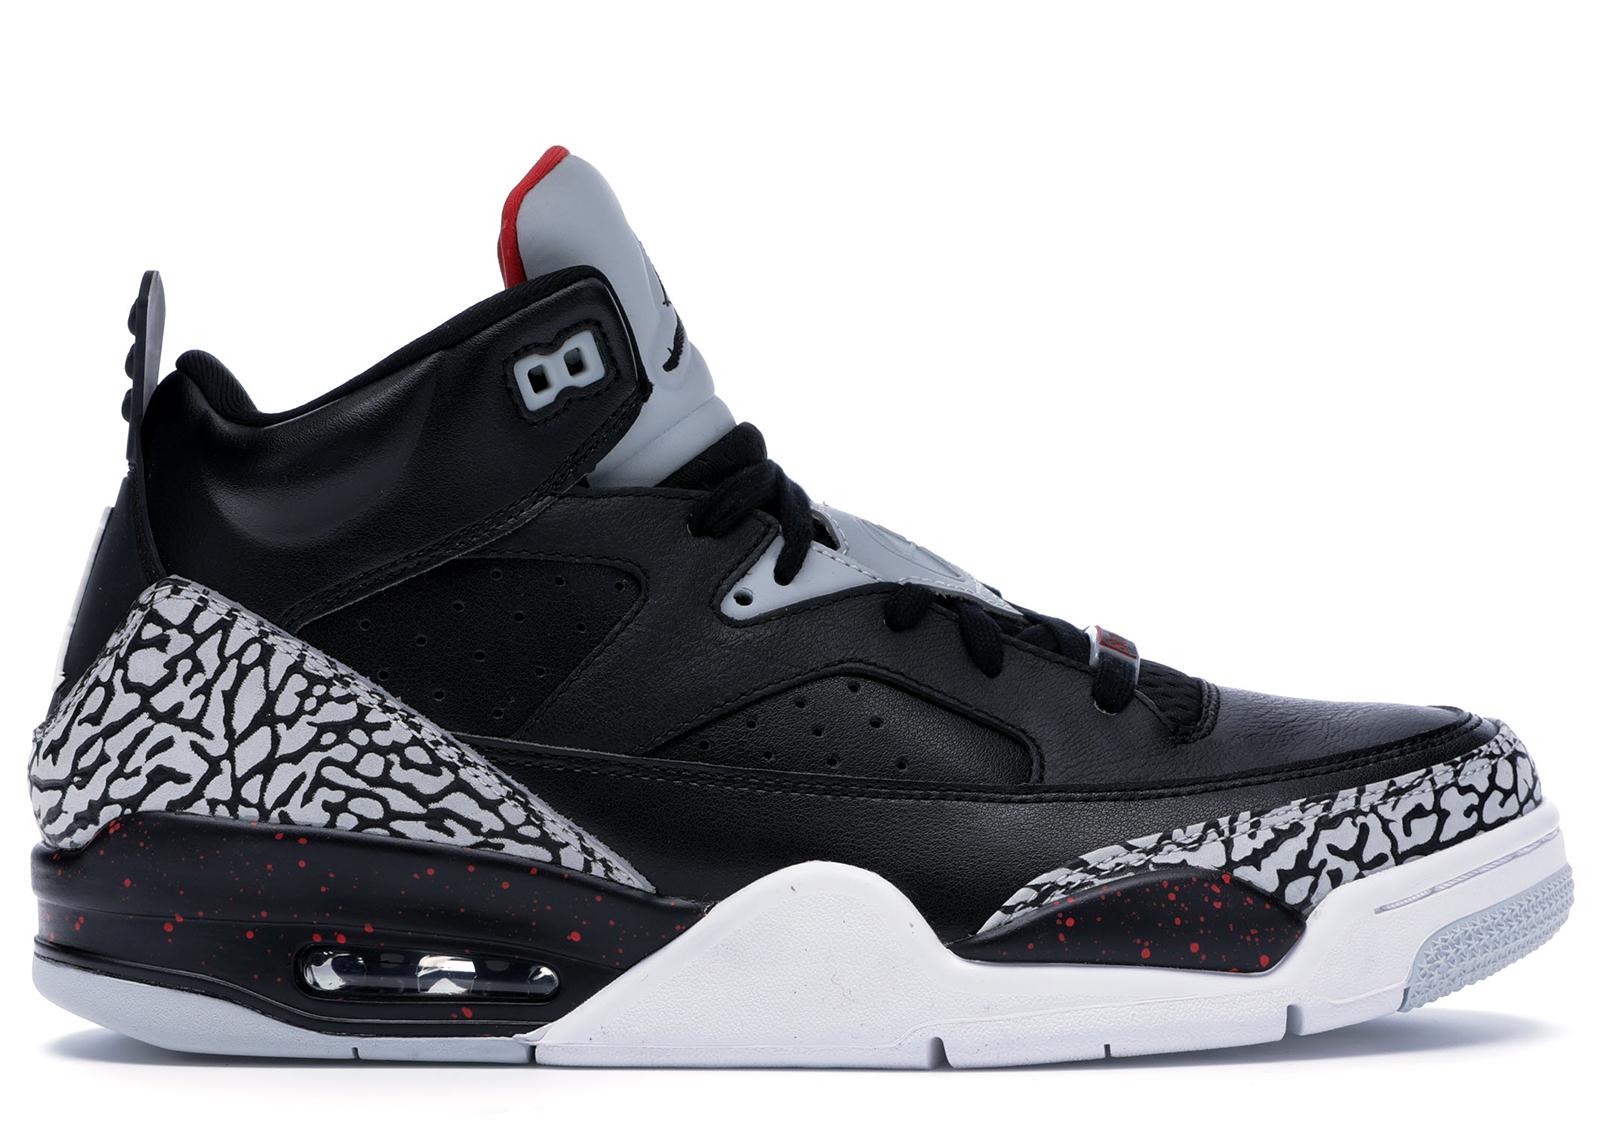 Jordan Son of Mars Low Black Cement